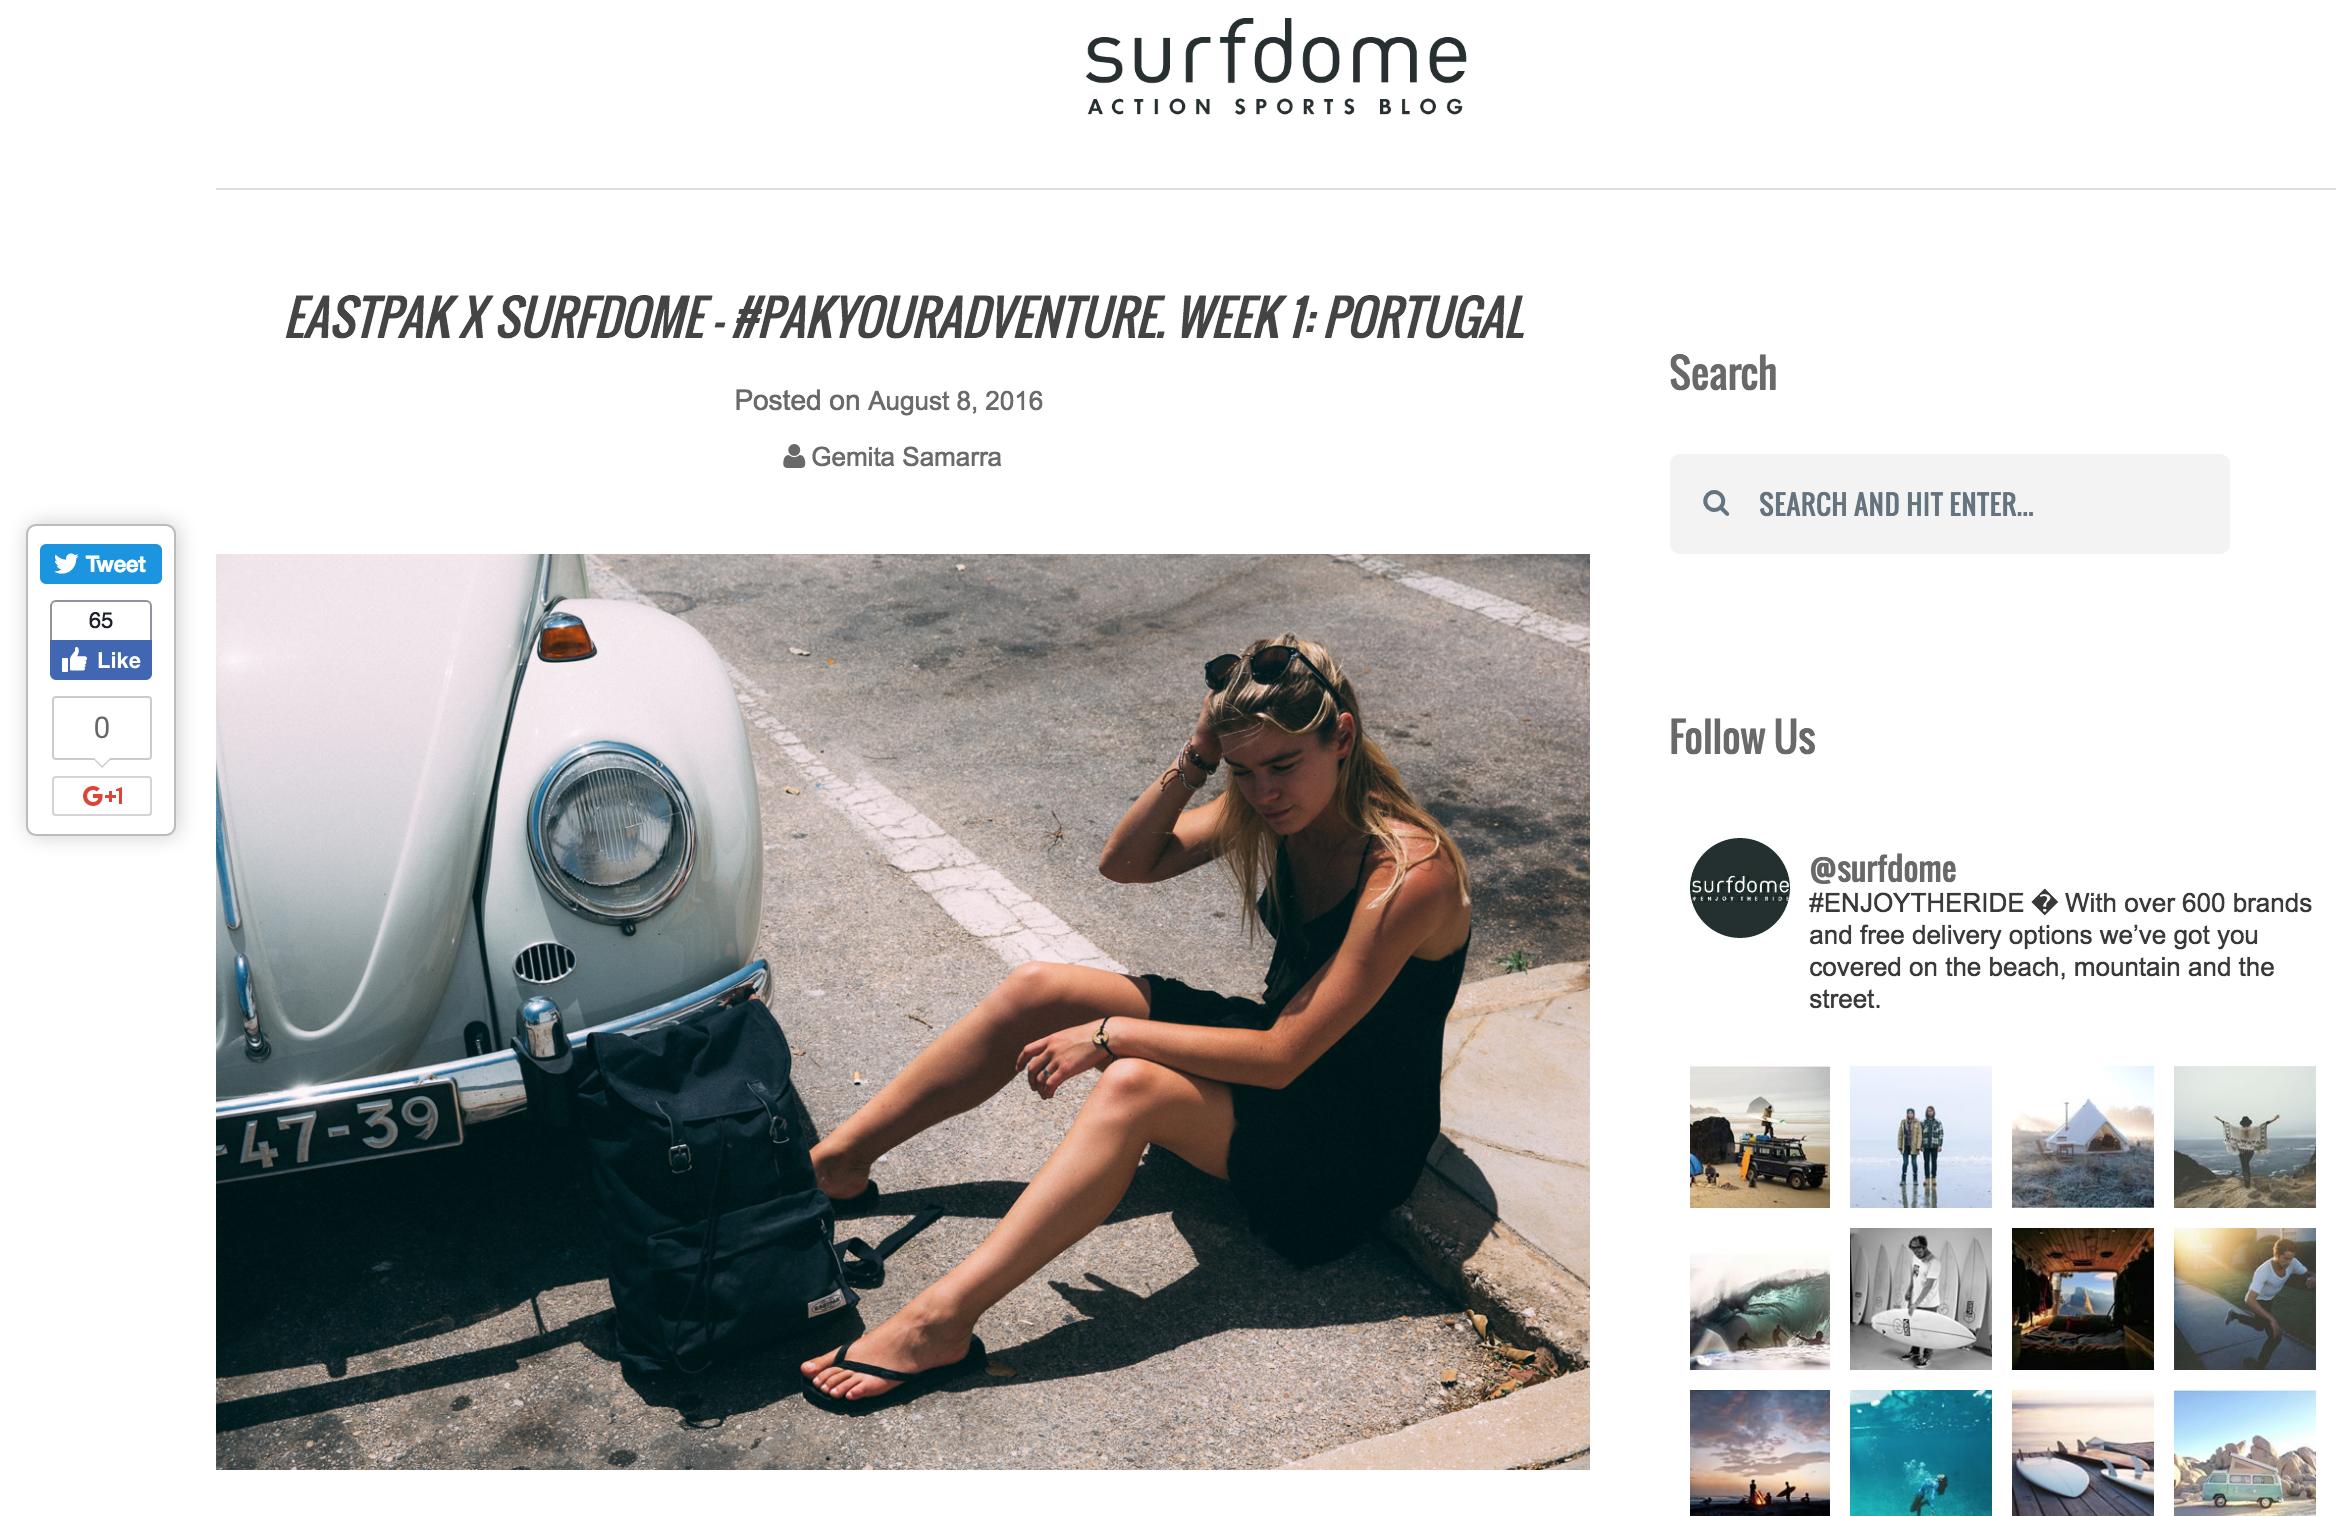 SURFDOME X EASTPAK Portugal    https://www.surfdome.com/lifestyle_blog/eastpak-x-surfdome-portugal/